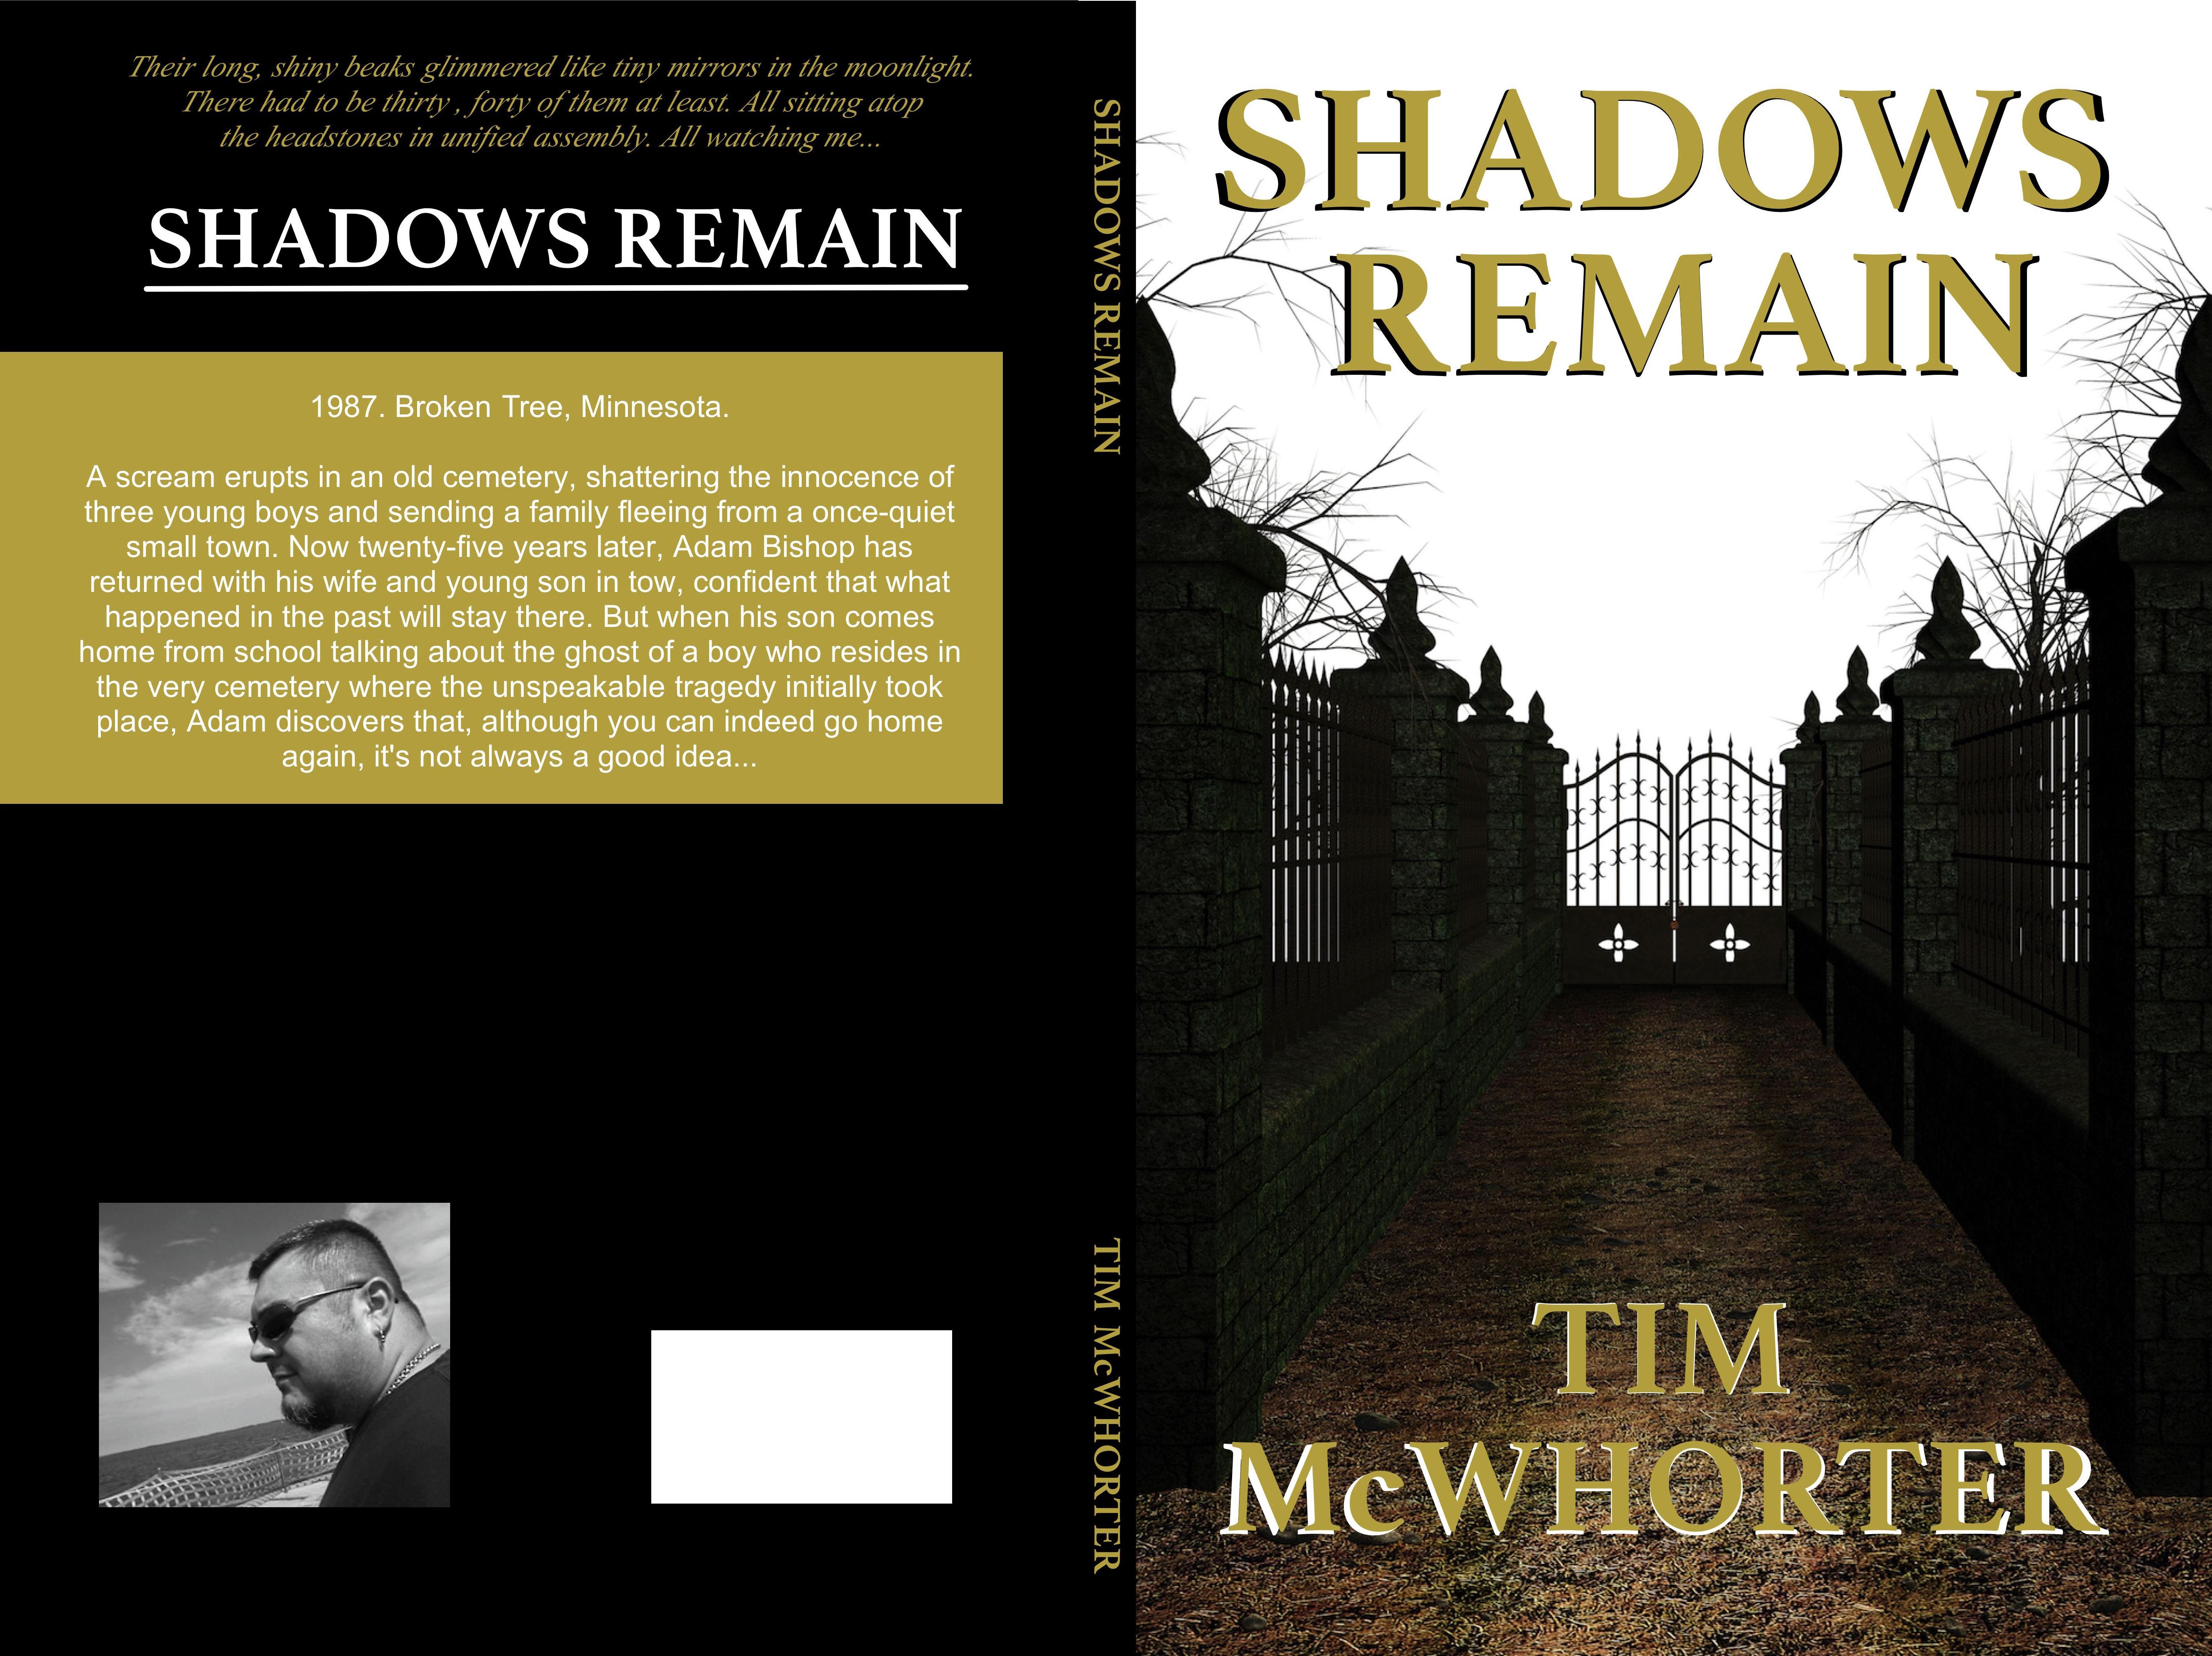 Shadows Cover.jpg